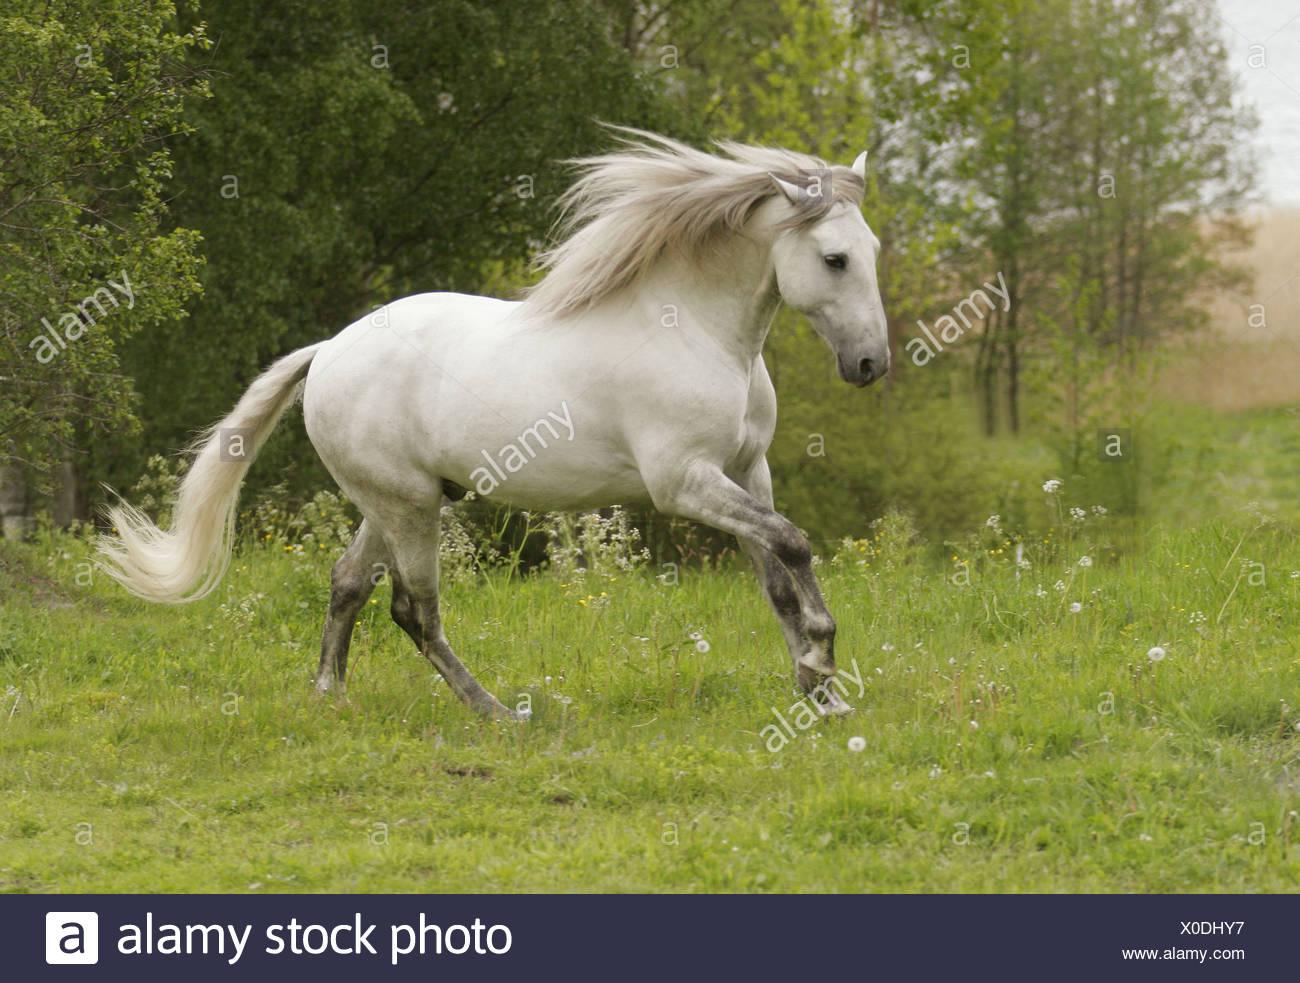 Lusitano horse running. Sweden - Stock Image